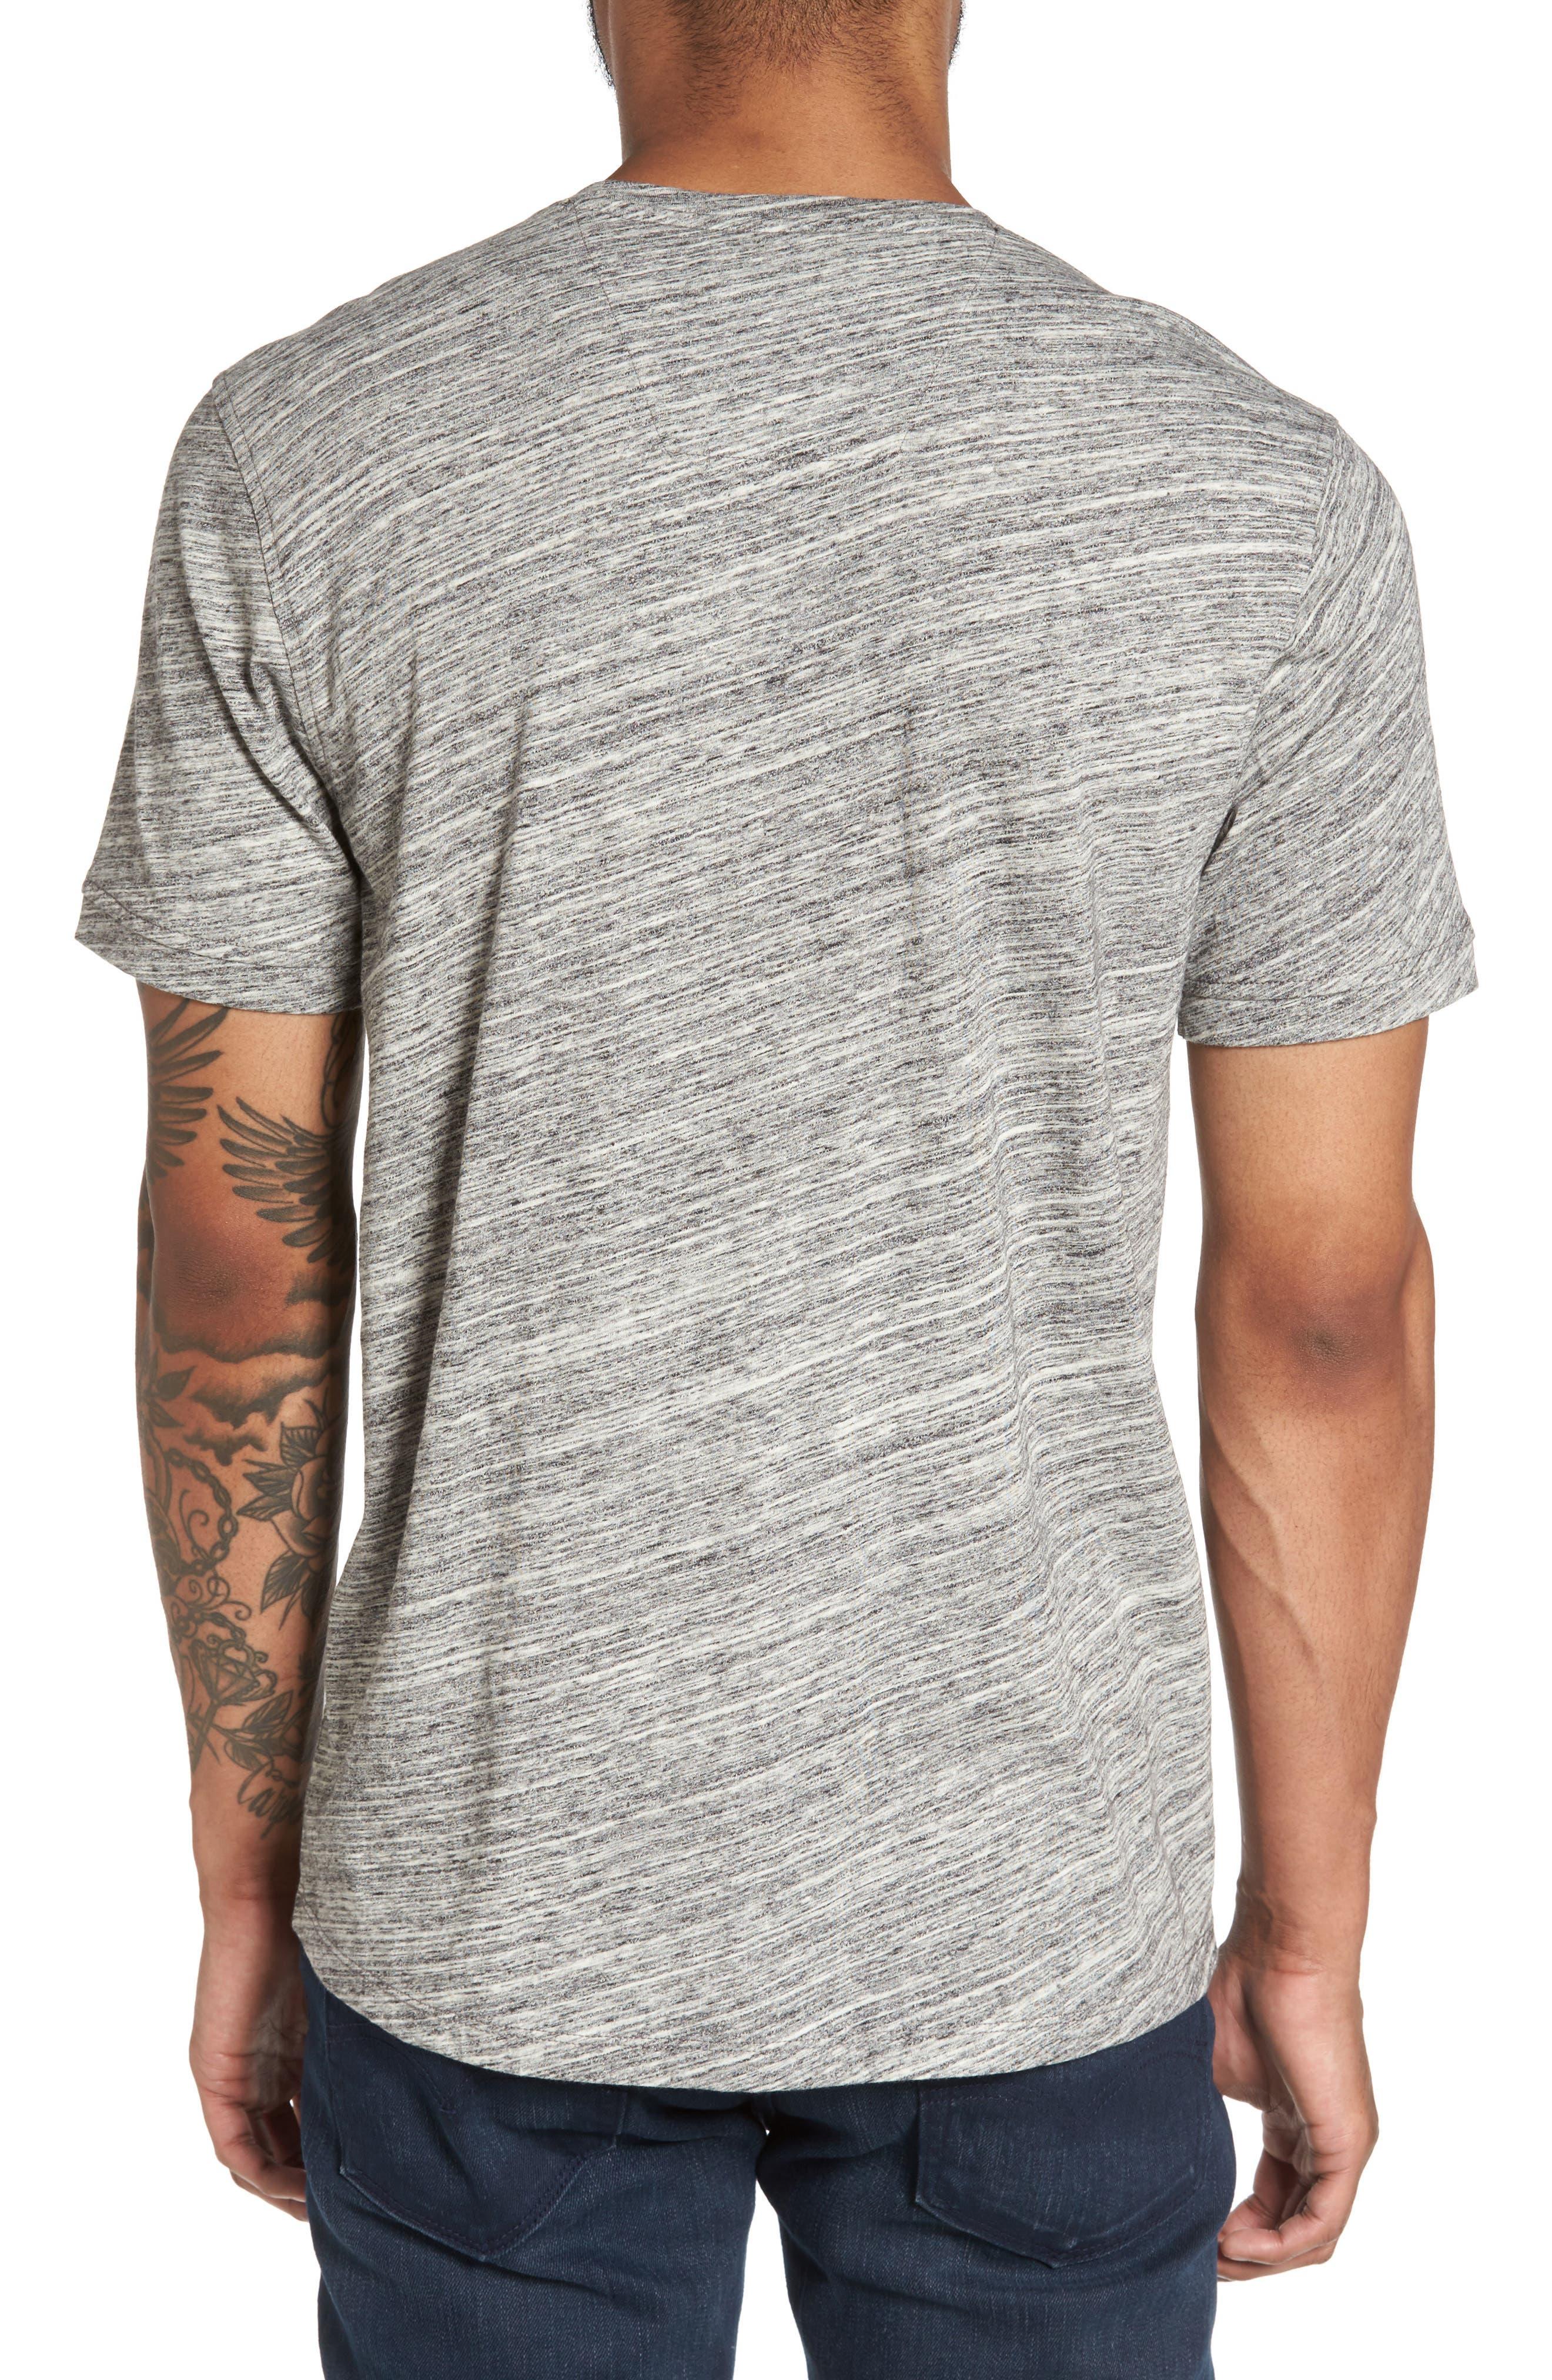 Texture T-Shirt,                             Alternate thumbnail 2, color,                             Ivory Egret Spacedye